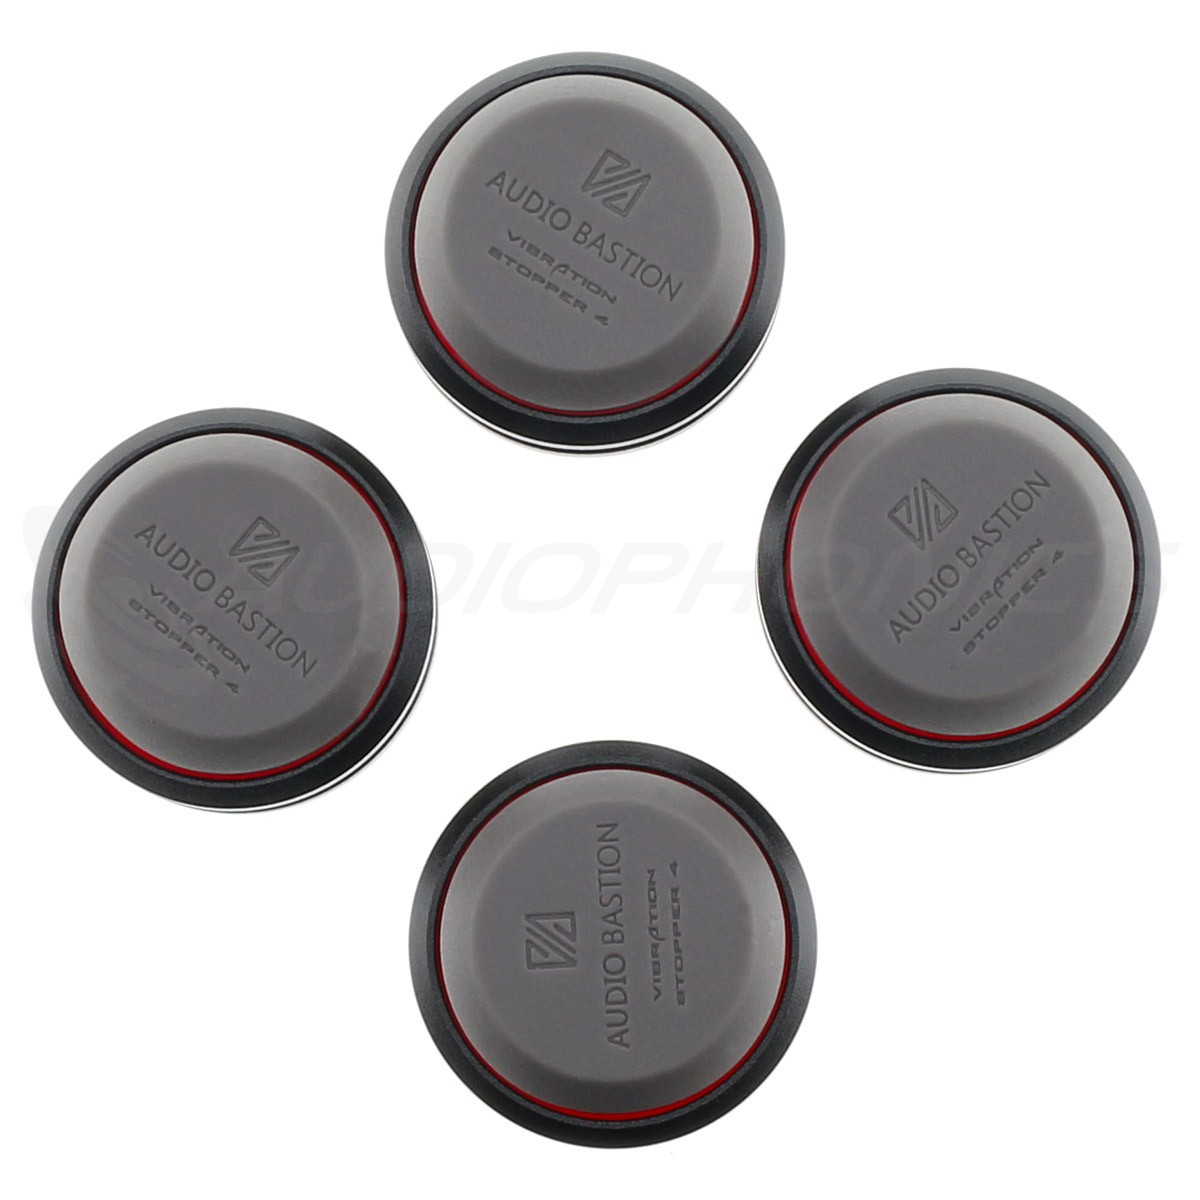 AUDIO BASTION REDLINE DAMPER Absorbeurs de Vibrations Aluminium / Silicone 41 x 17mm (Set x4)